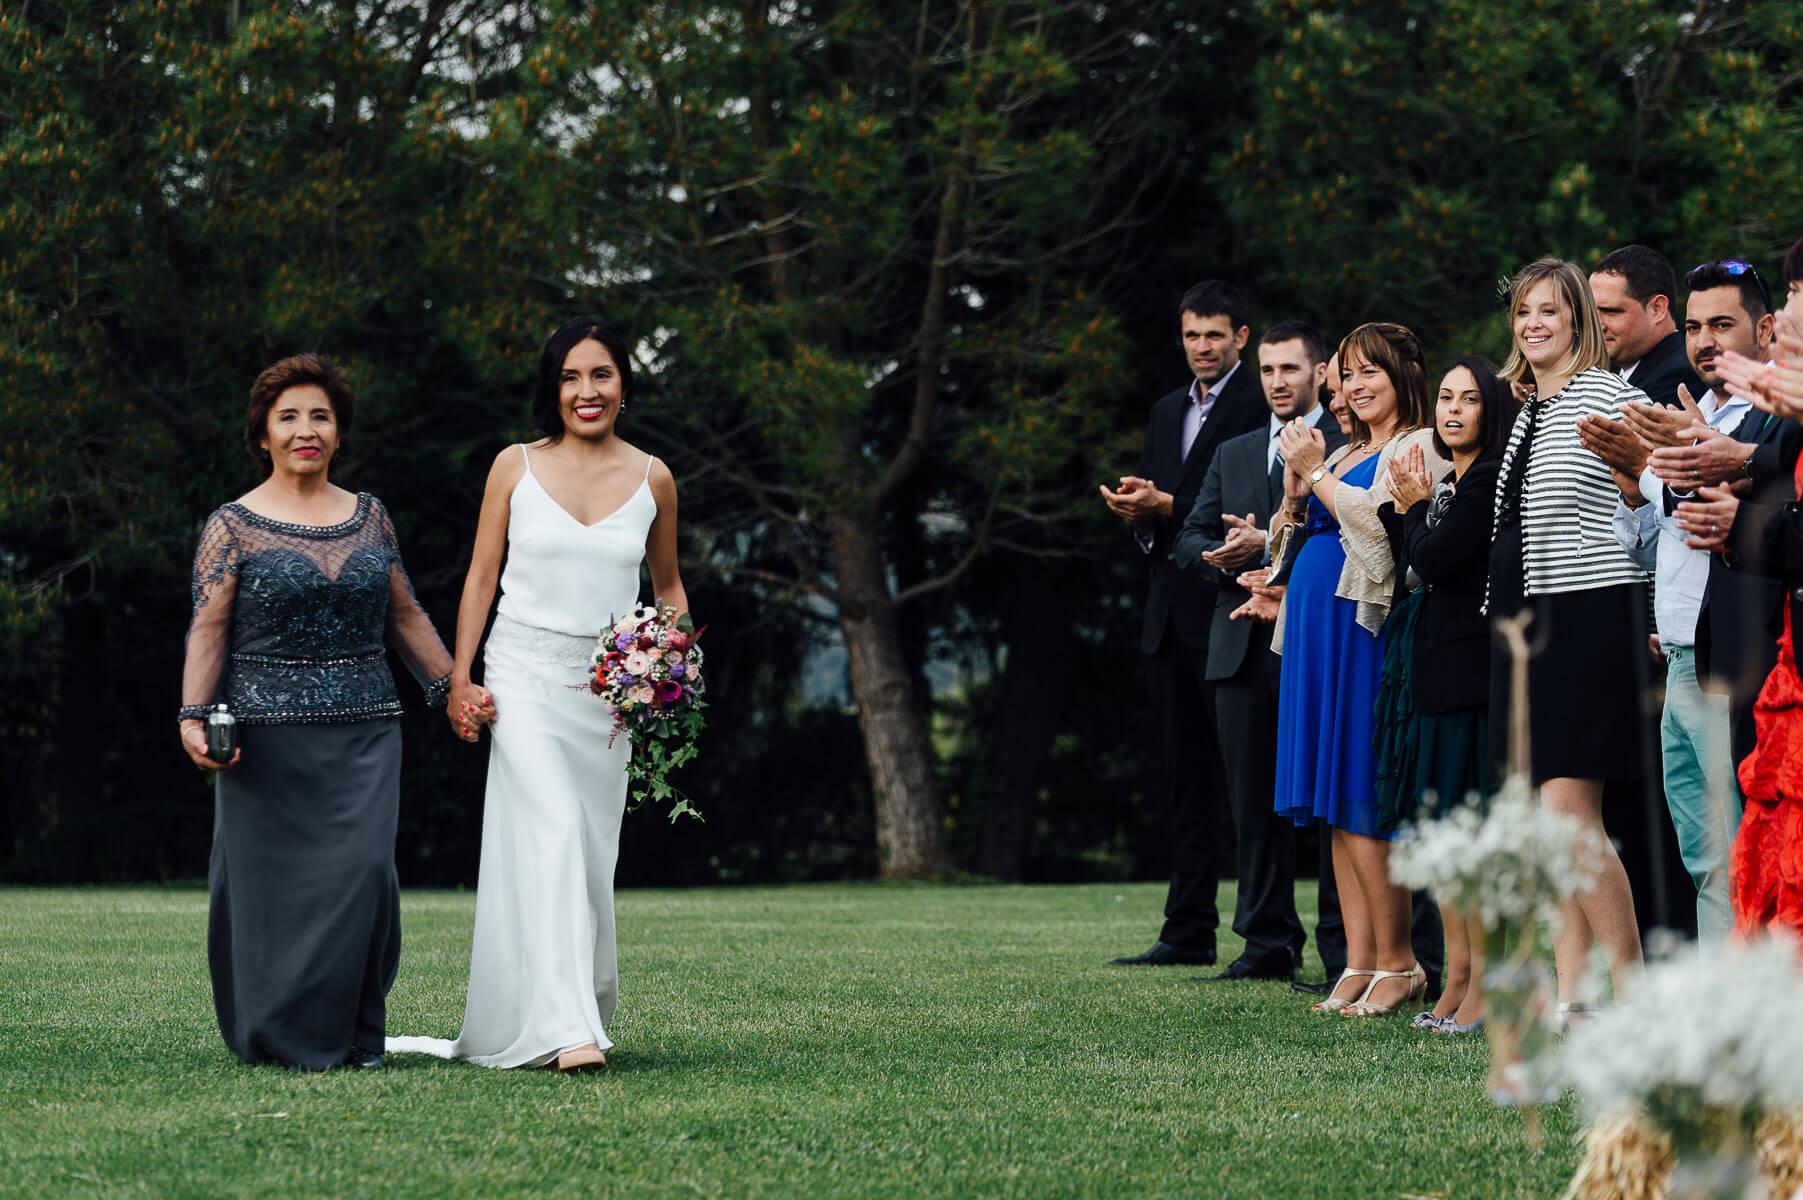 Boda Carla & Sergi - Manel Tamayo - fotografo de boda